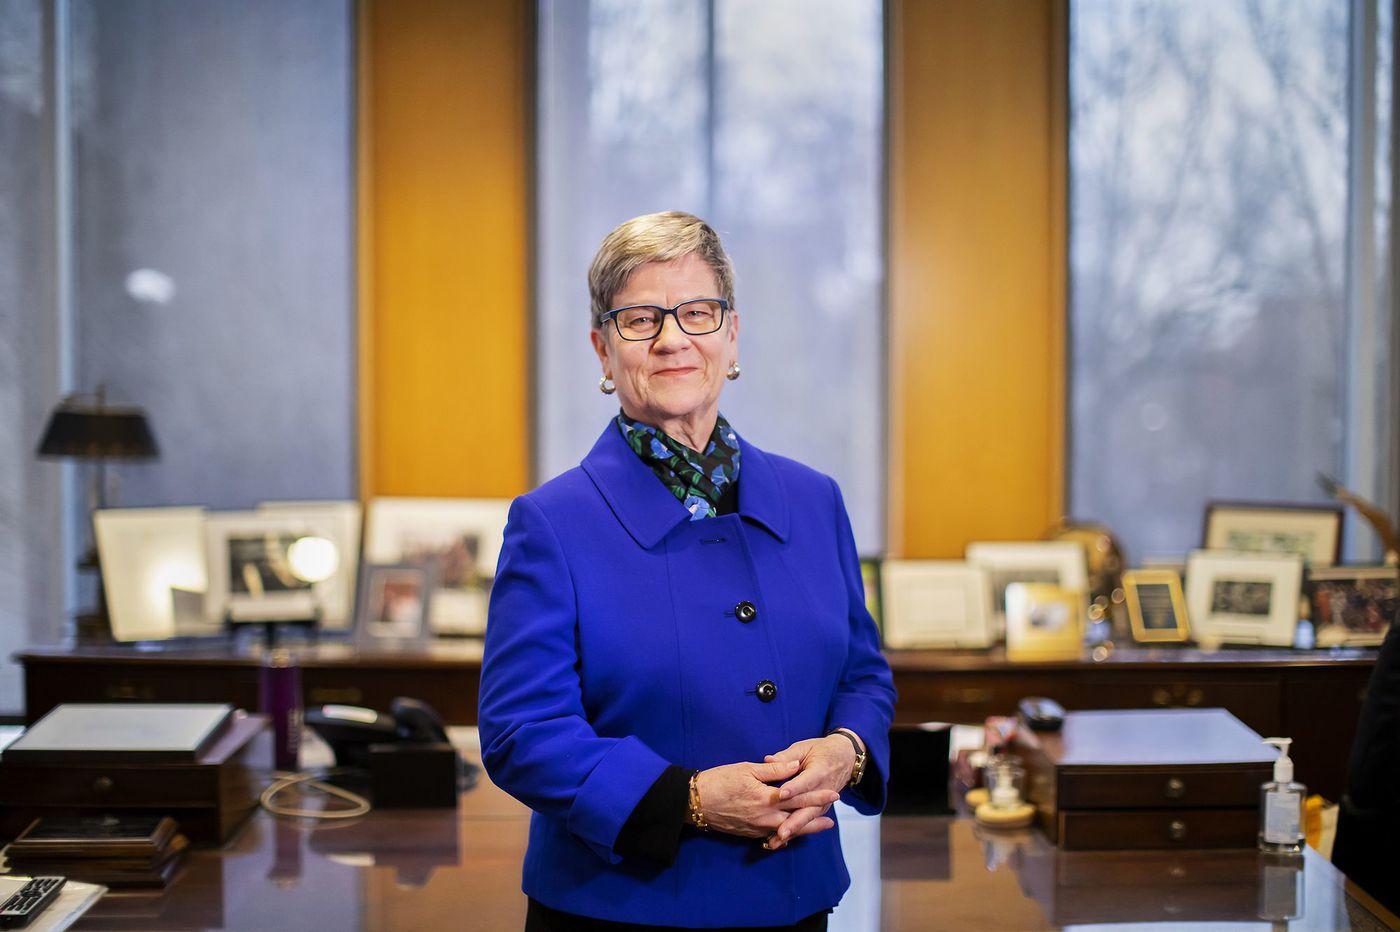 Penn's Kathleen Hall Jamieson wins National Academy of Sciences' biggest award